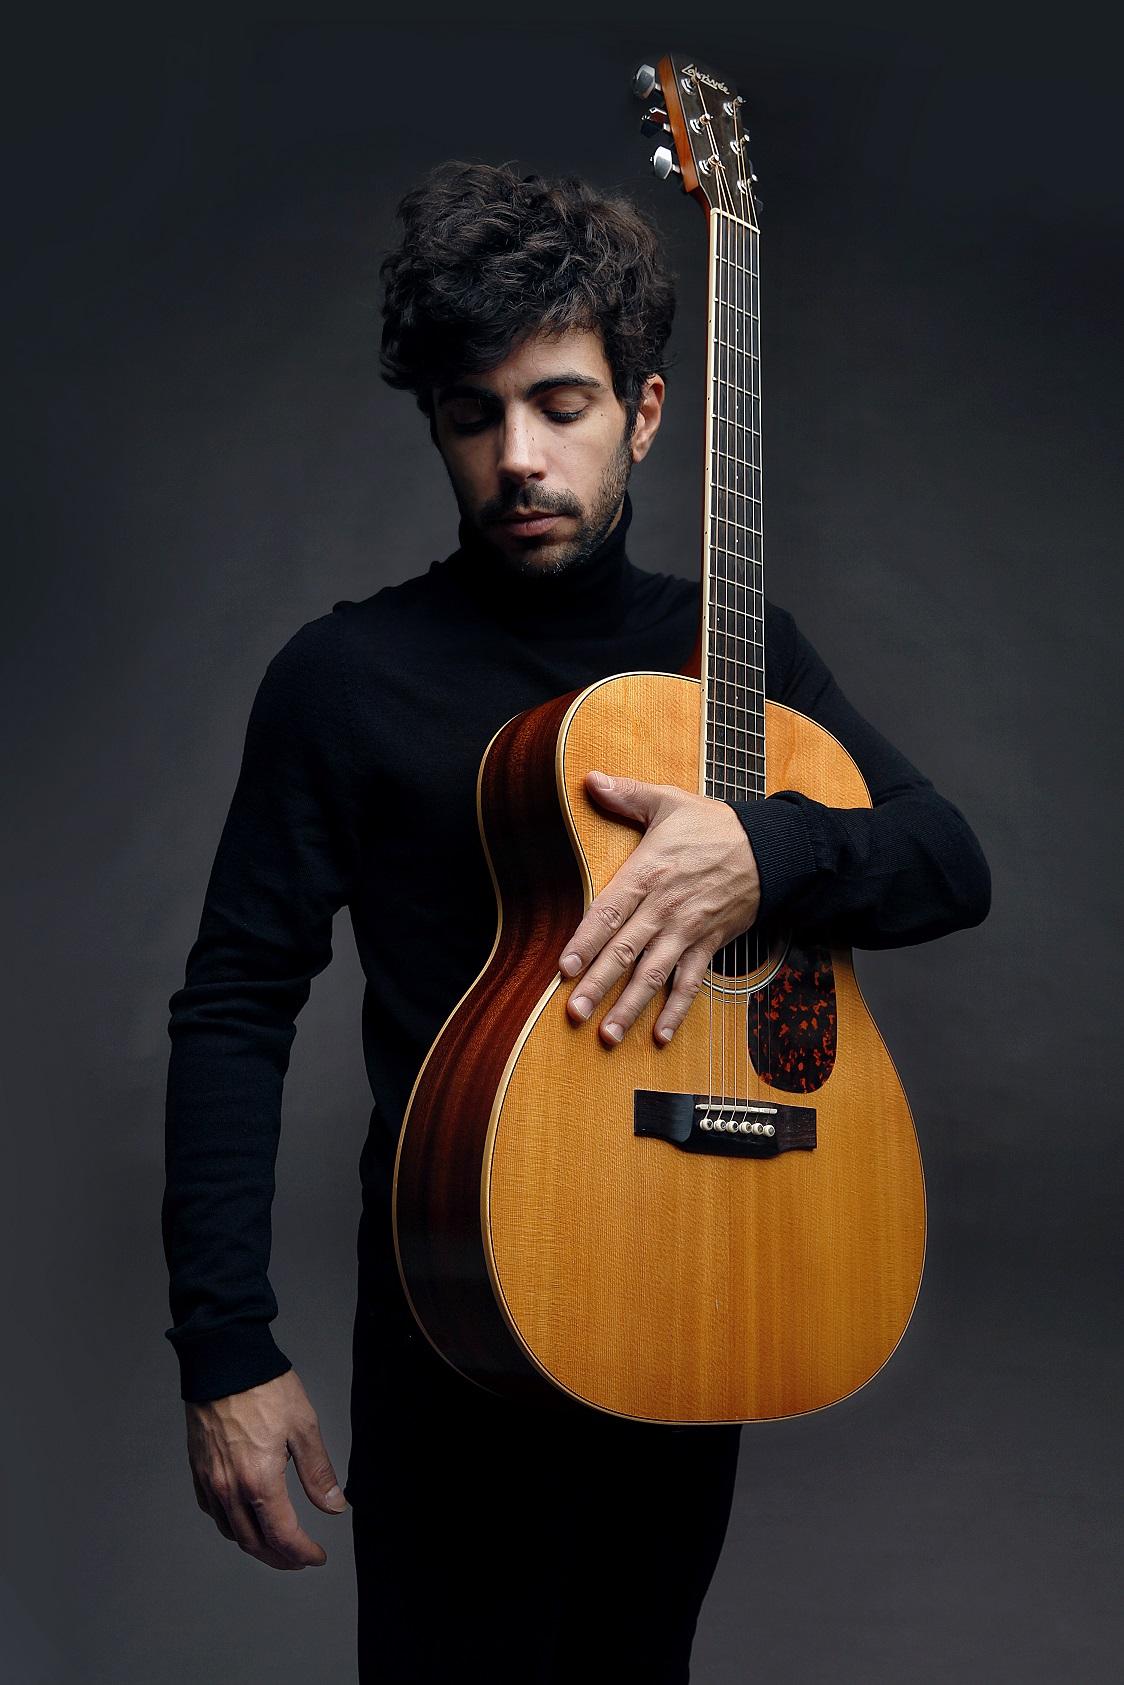 Lato w Mieście: João de Sousa